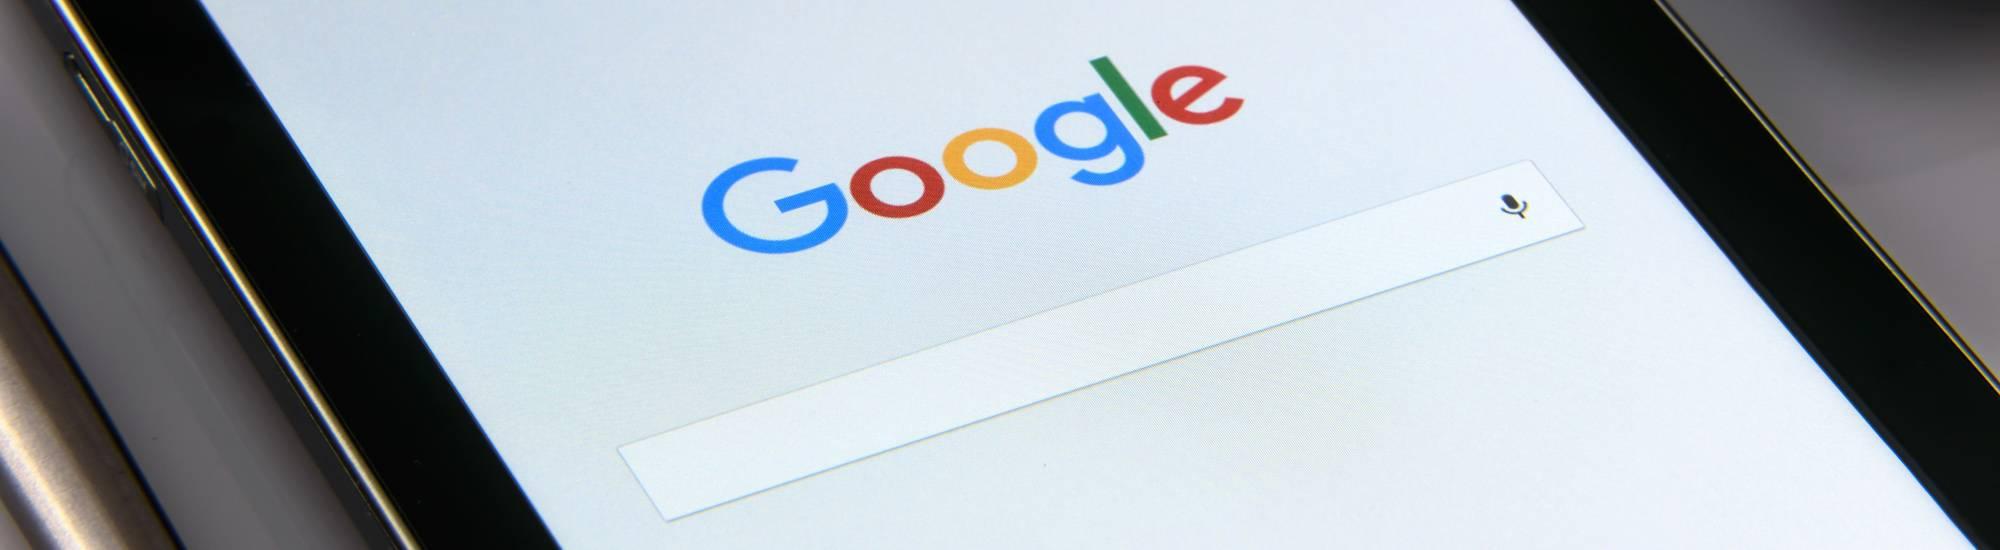 campagne publicitaire google adwords